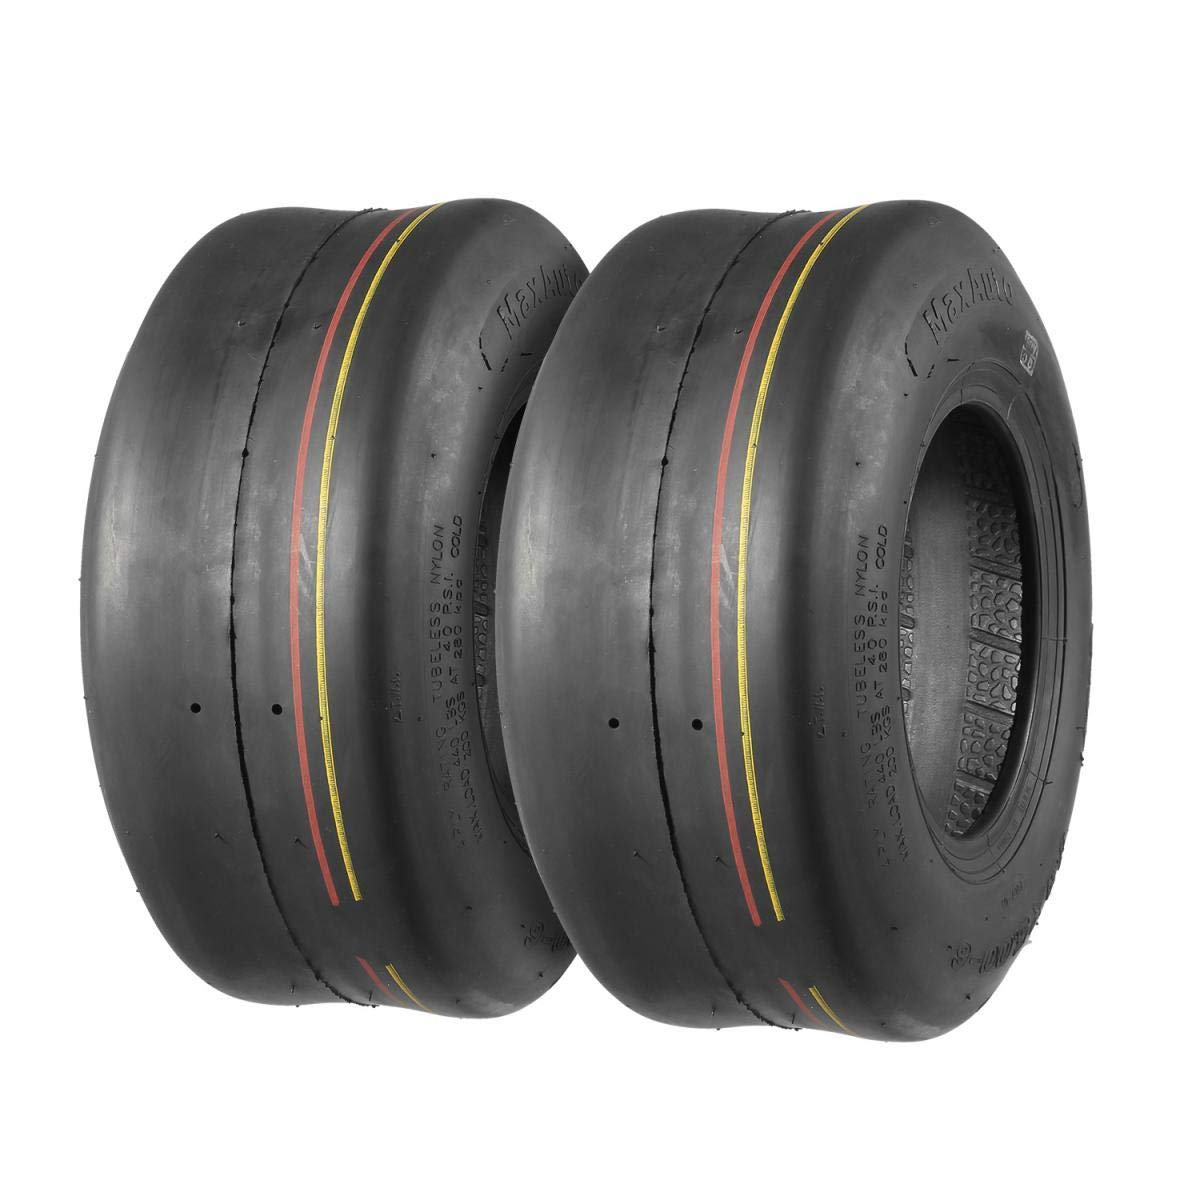 Juego de 2 neumáticos de 13 x 5.00 - 6 13/5-6 13-5-6 Turf 4 ...